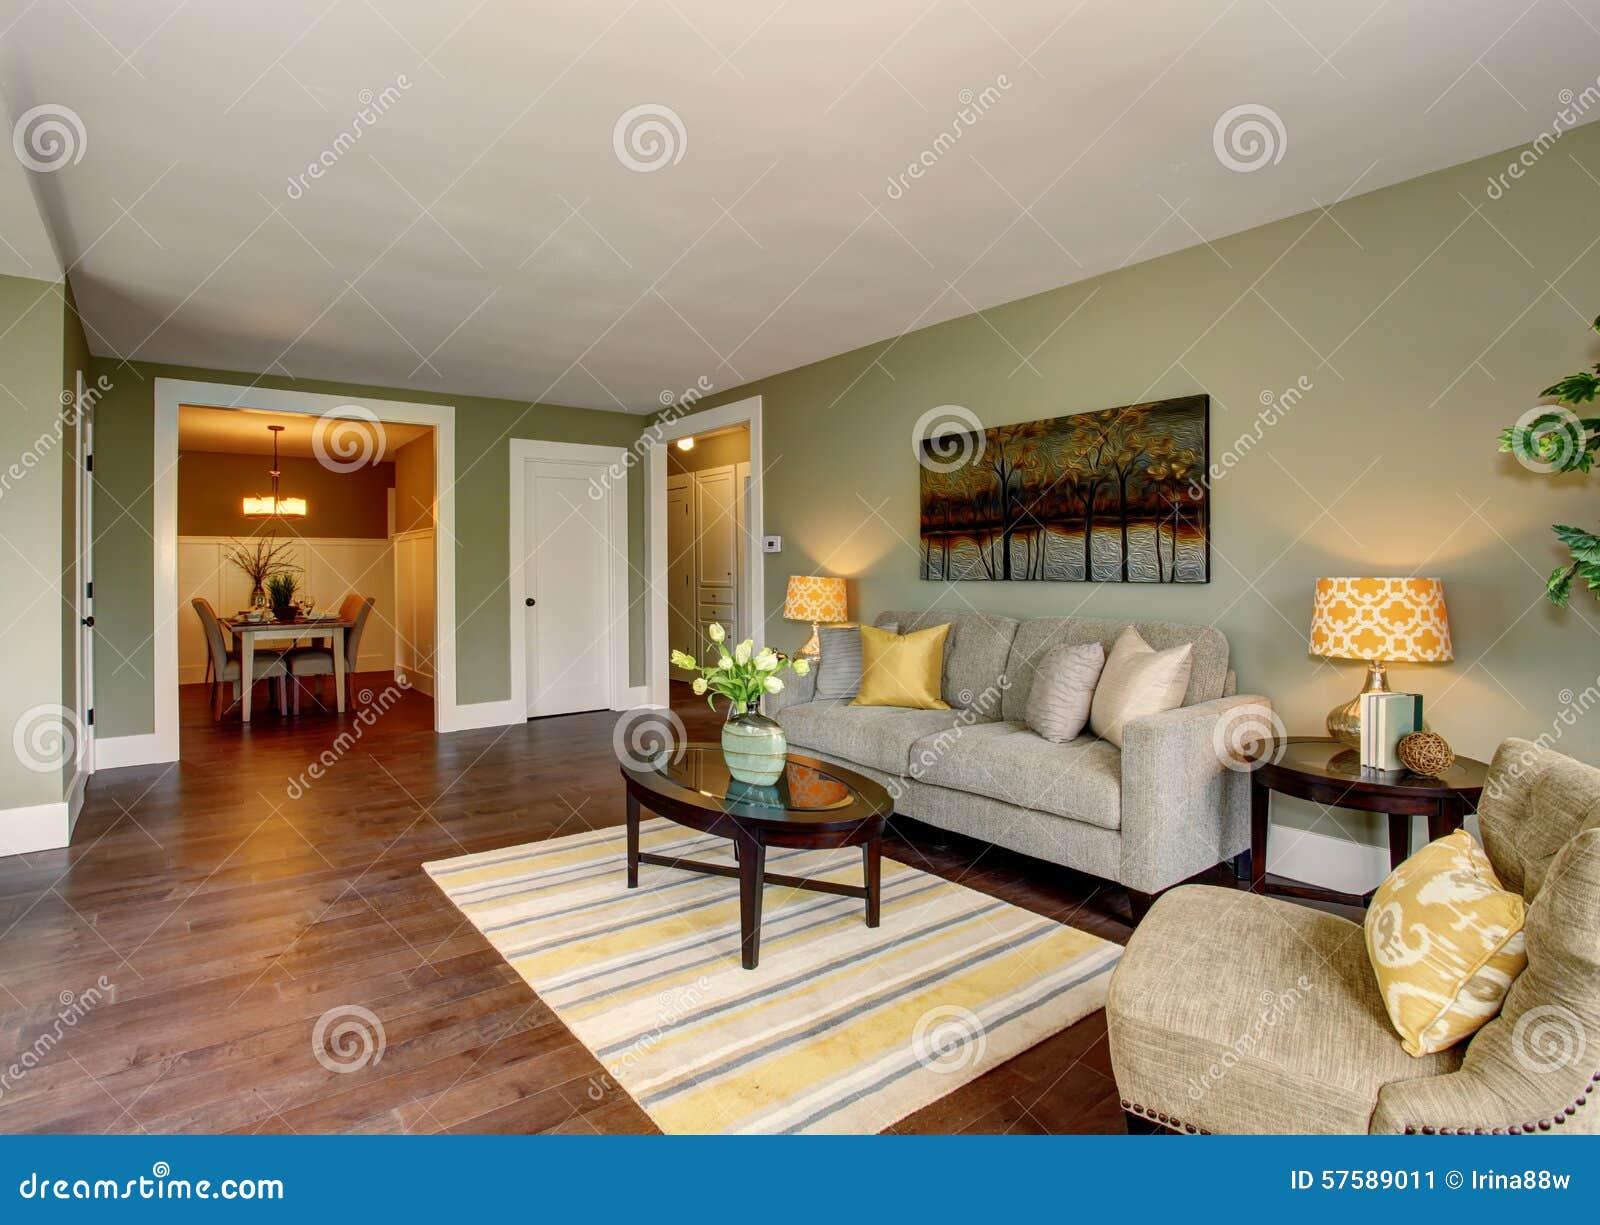 Mooie Woonkamer Met Groen En Geel Thema Stock Afbeelding ...